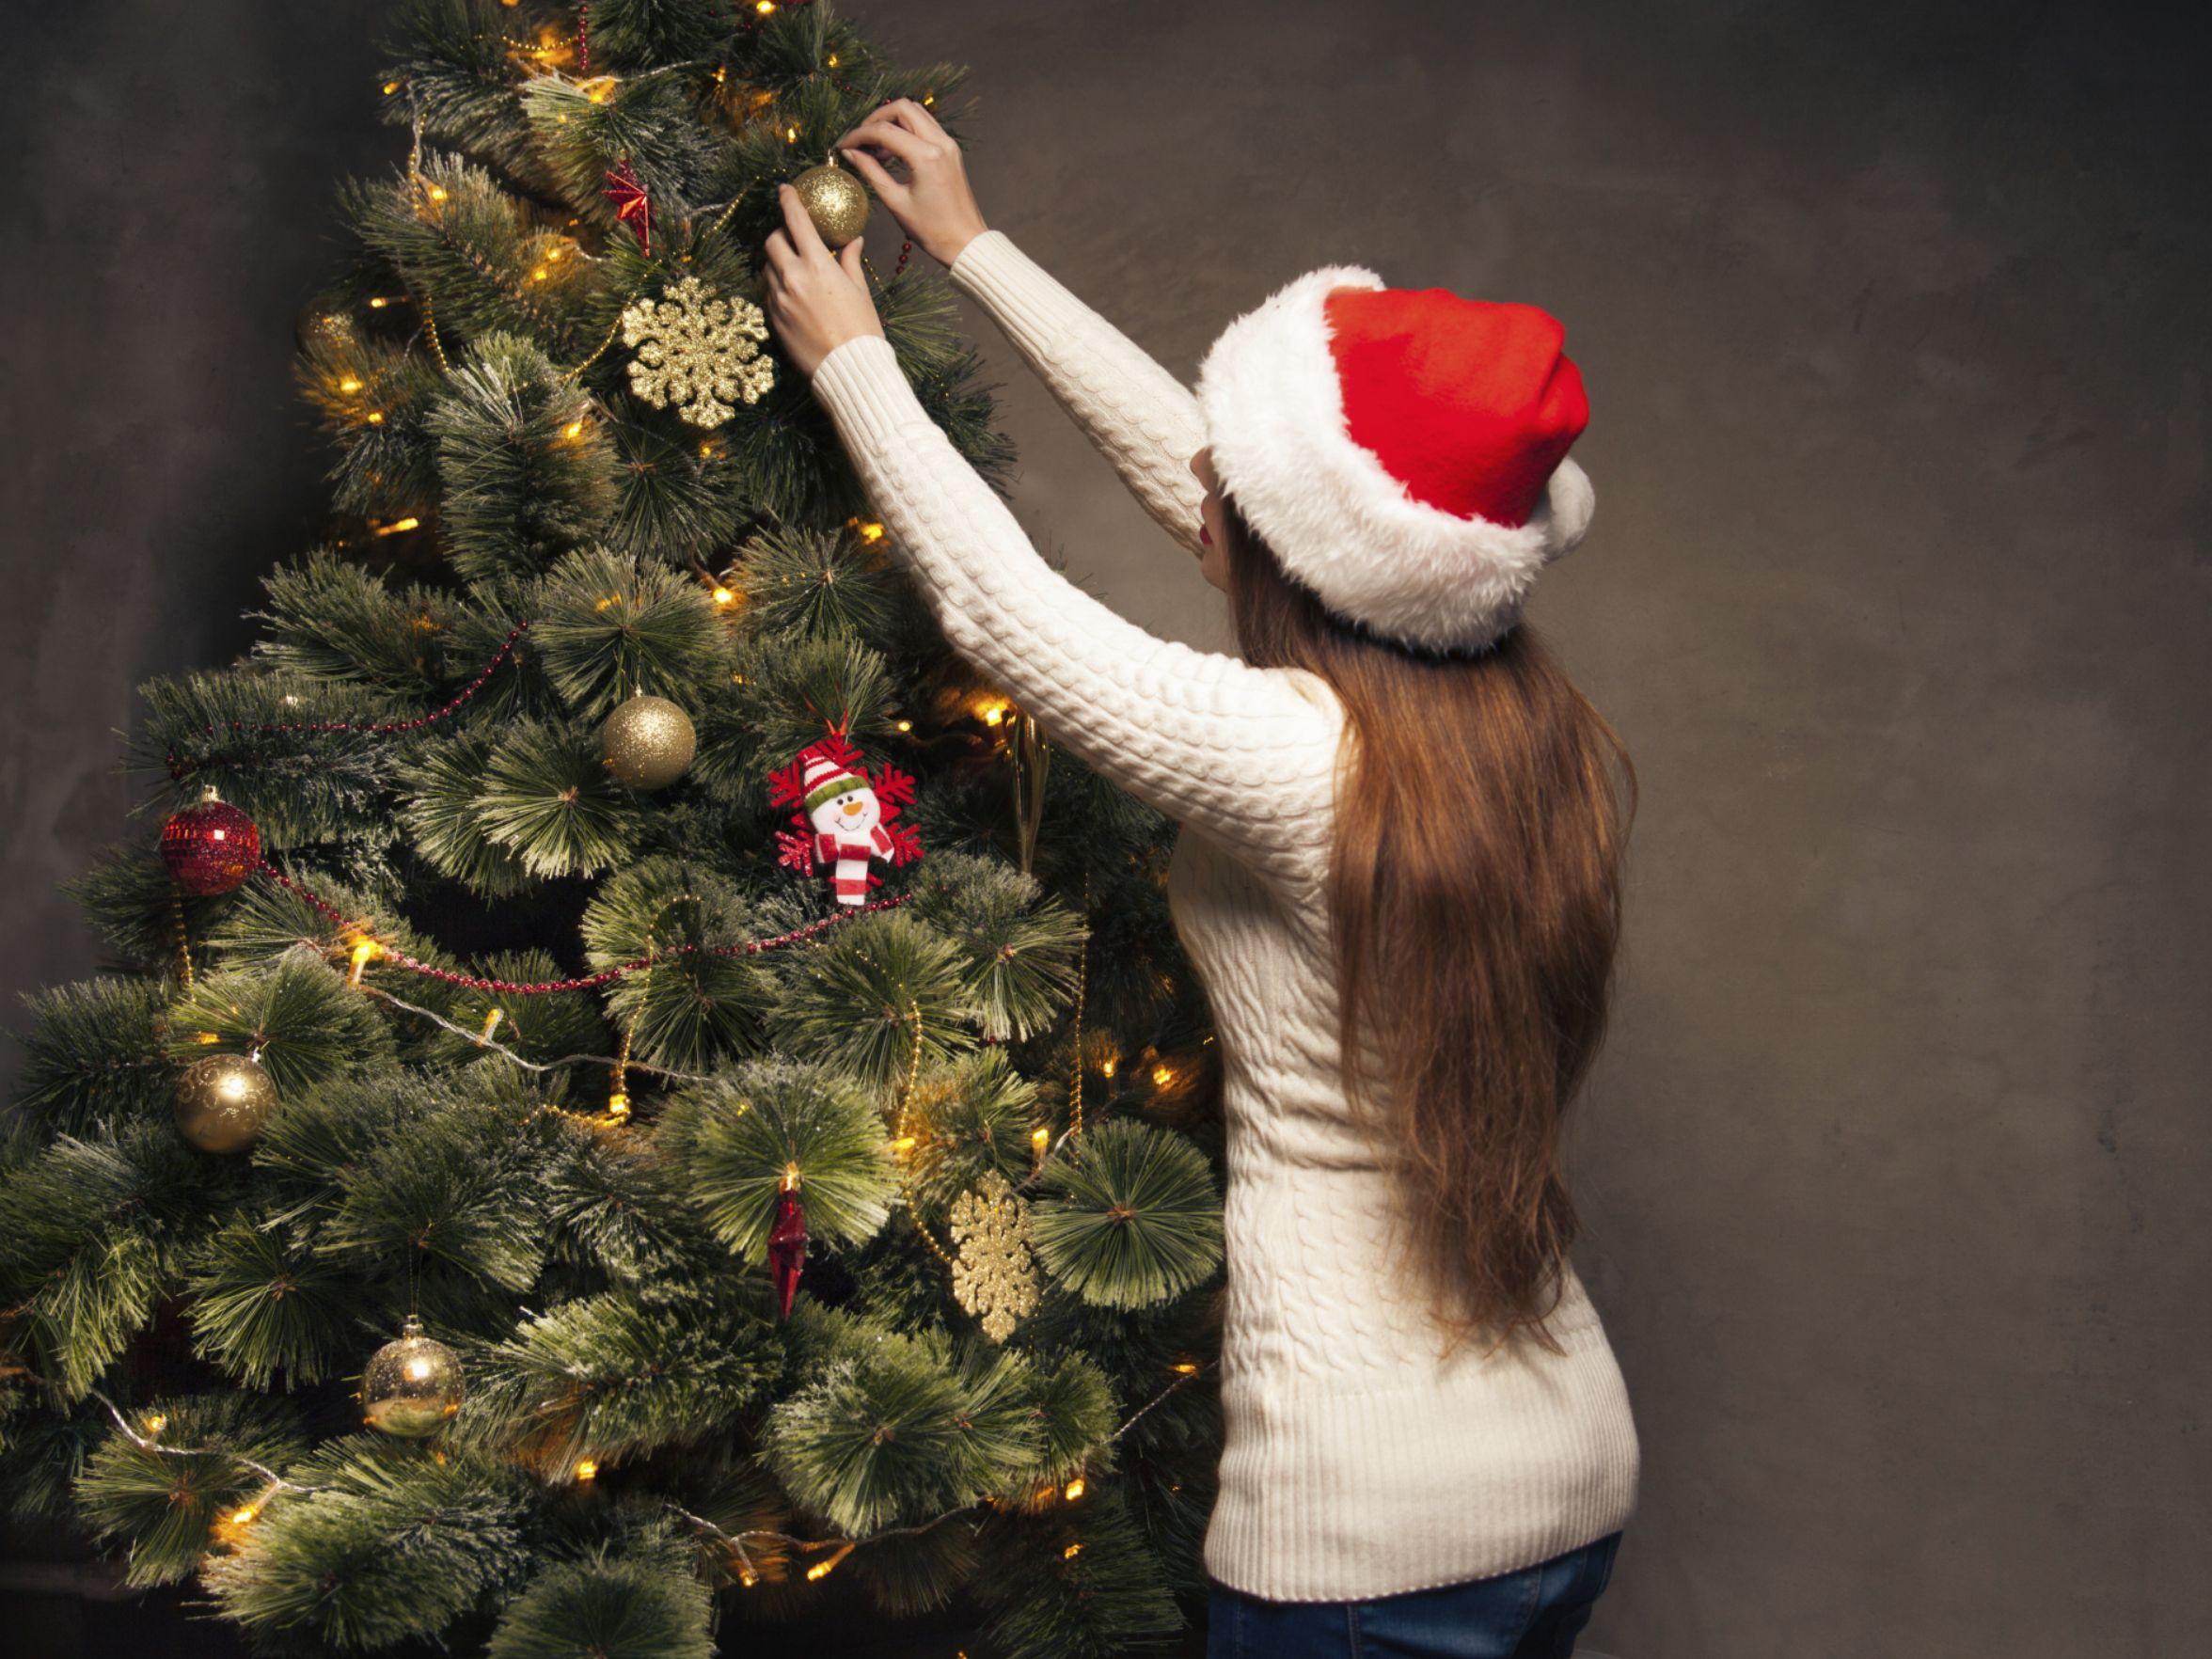 Cinco ideas creativas para decorar tu casa en navidad for Ideas para decorar tu casa